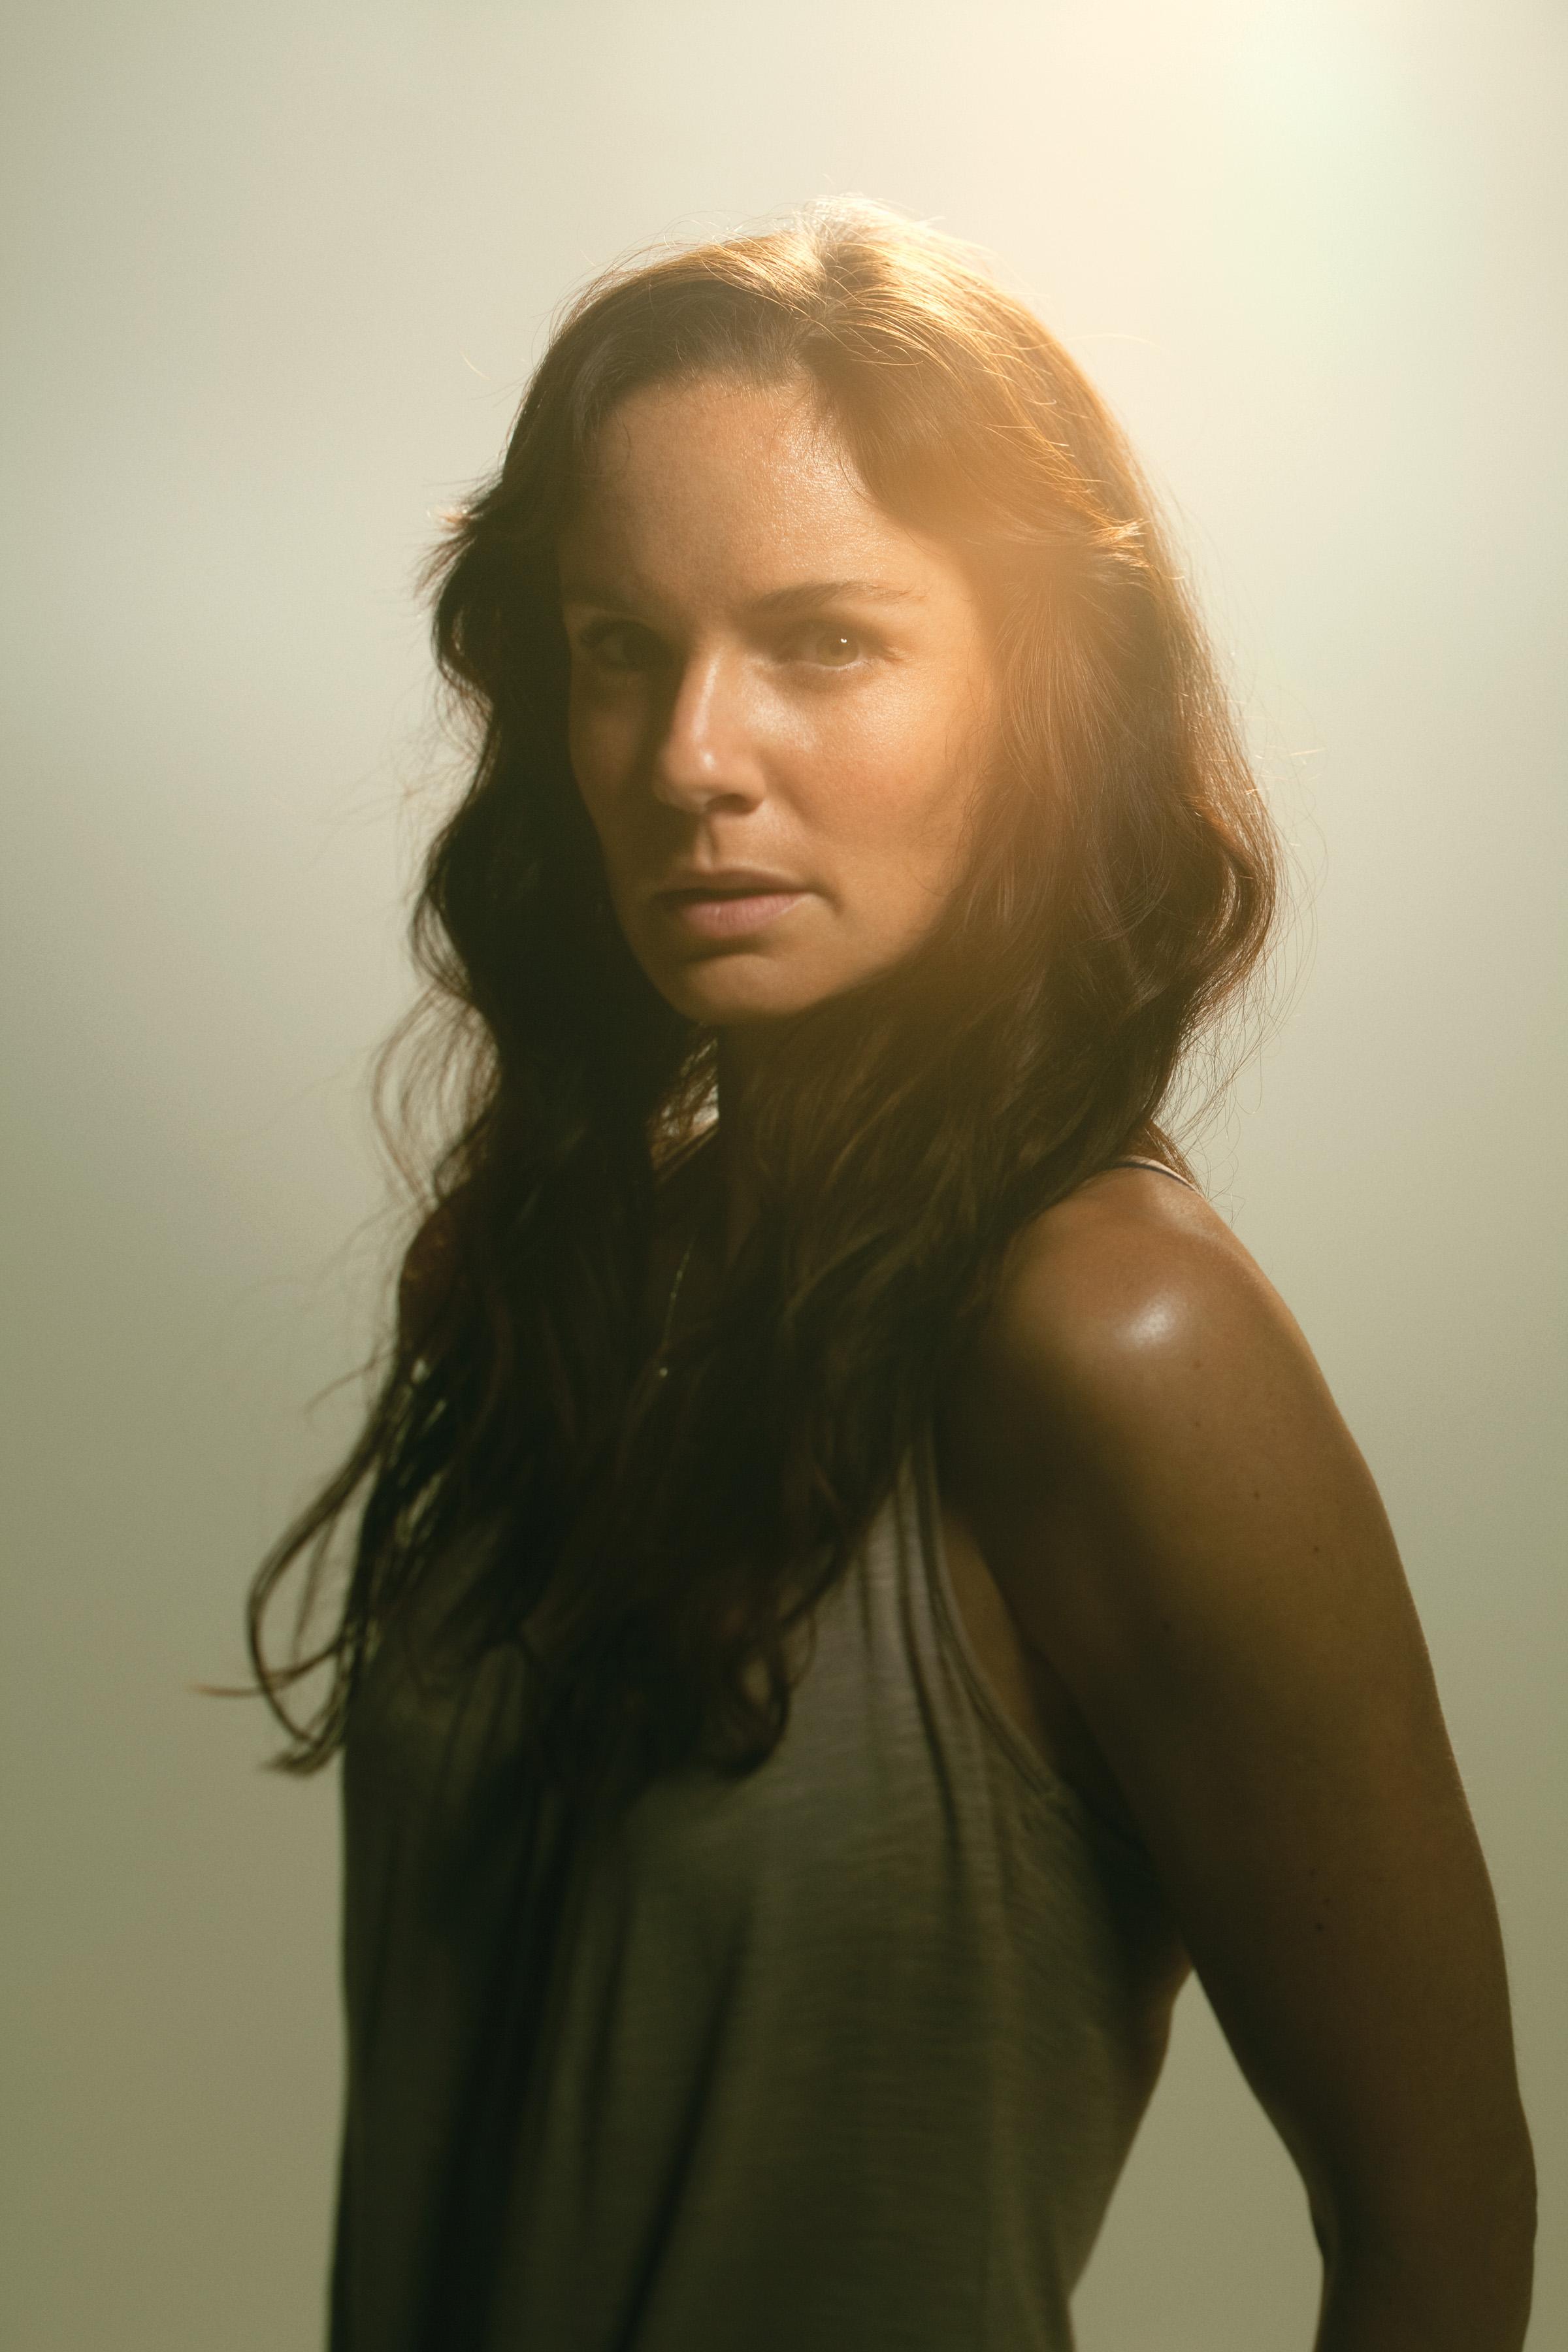 Lori Grimes TV Series Walking Dead